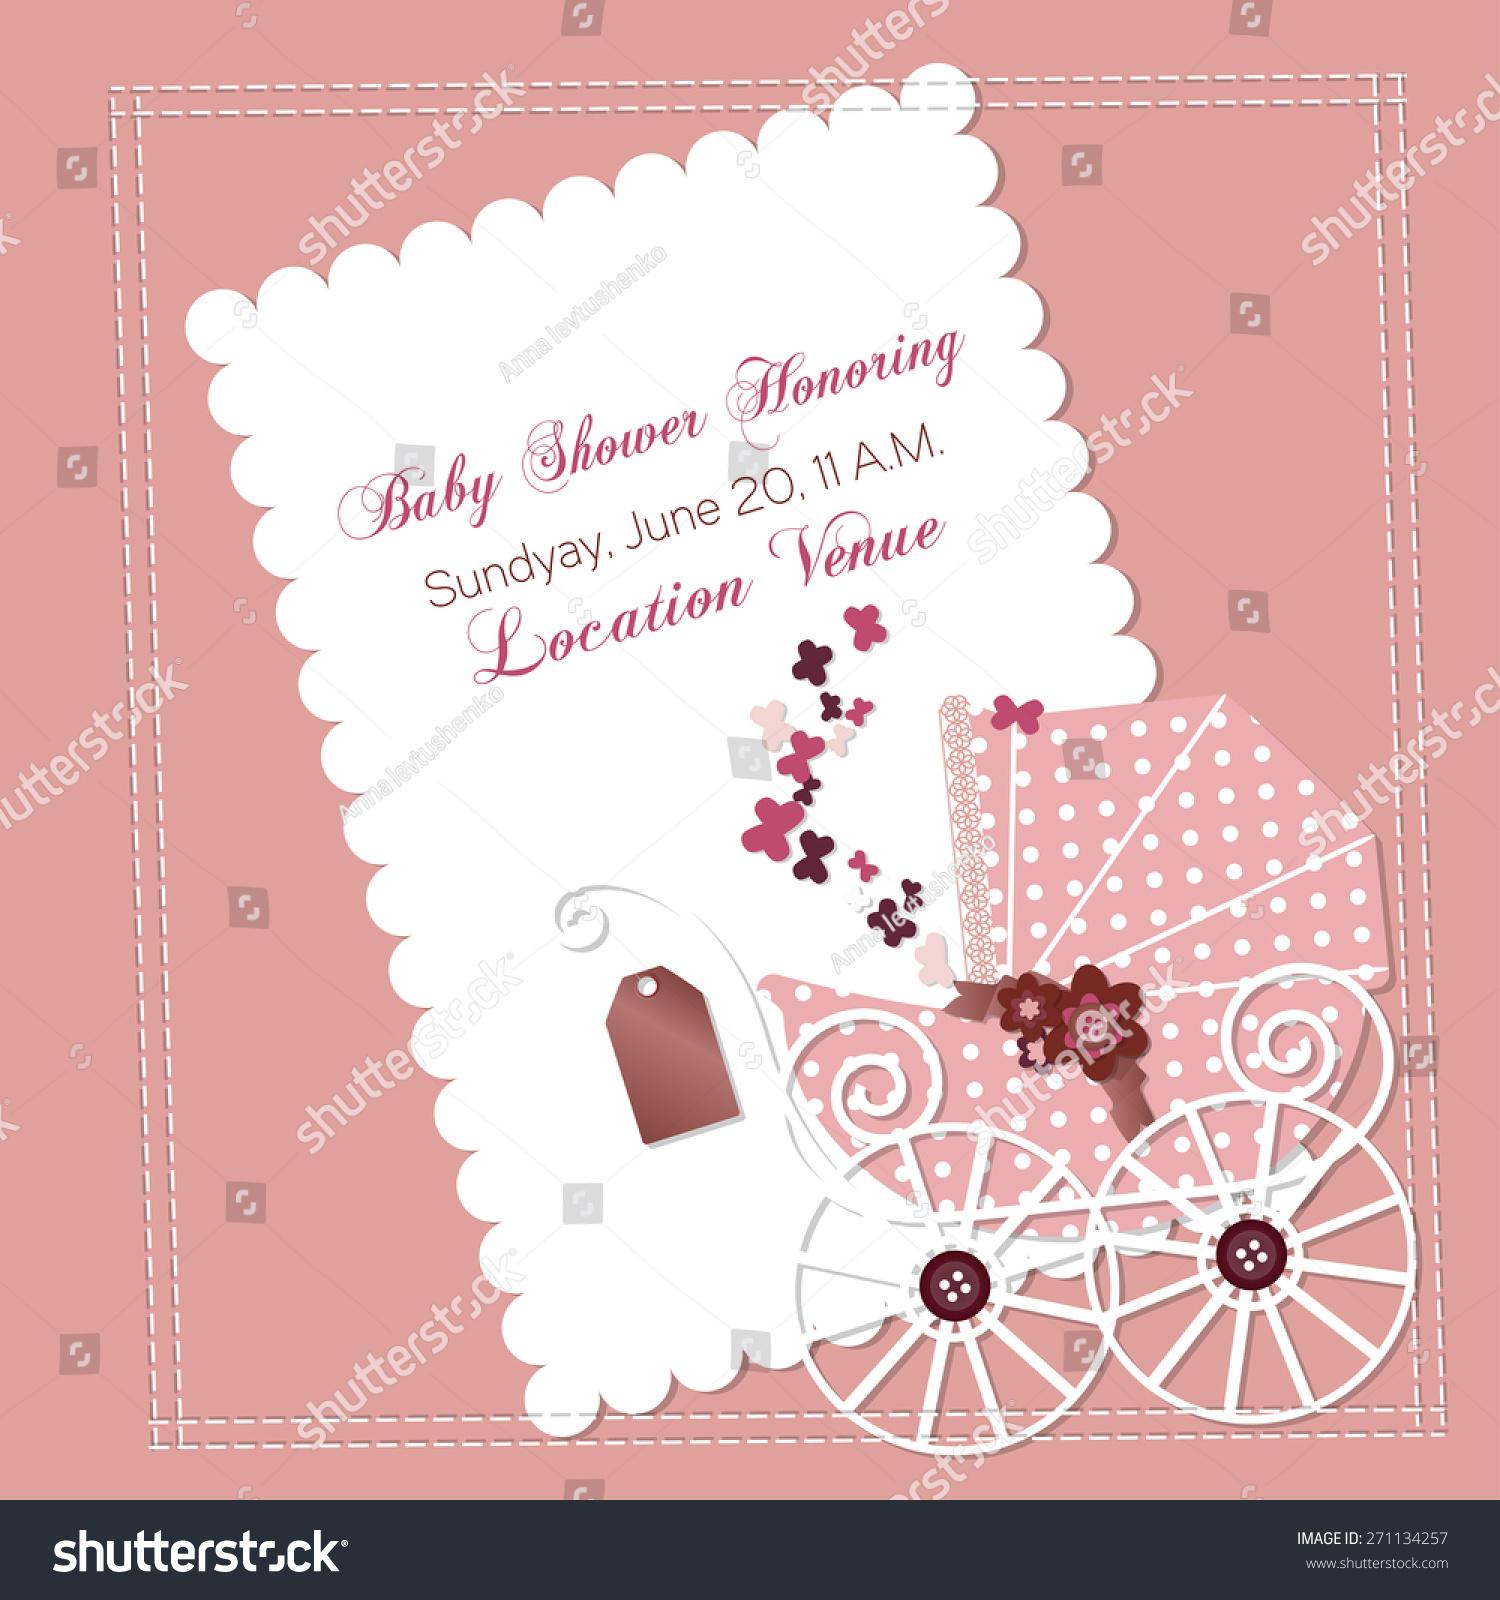 baby girl shower invitation templates